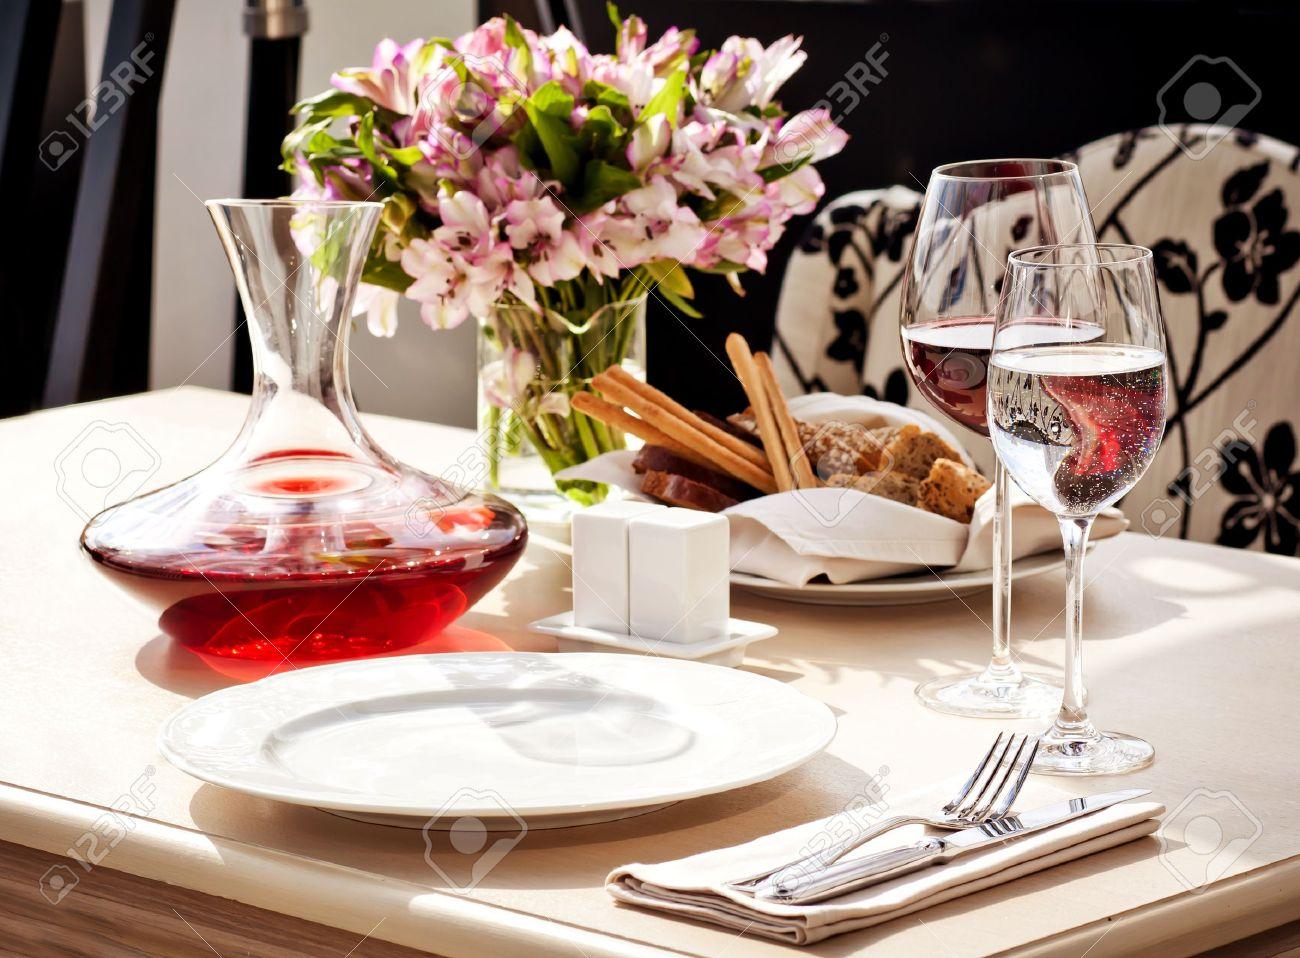 Fine Restaurant Dinner Table Place Setting Stock Photo   11708665